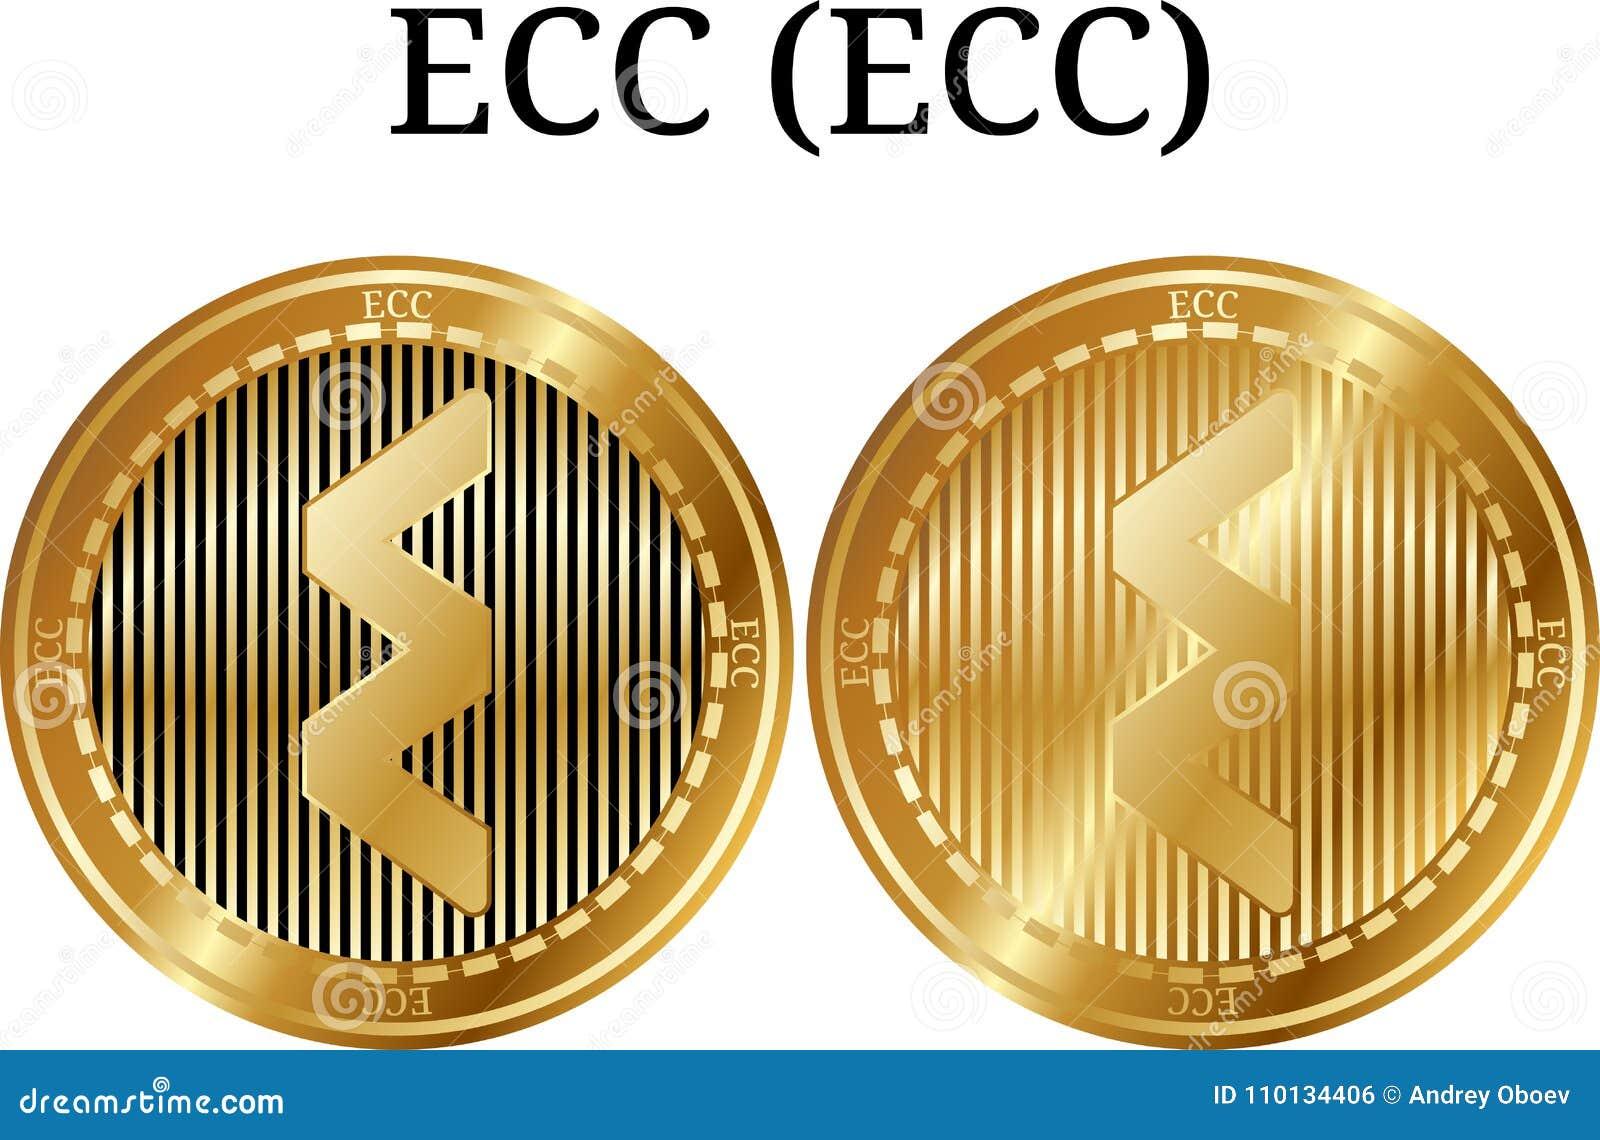 ecc bitcoin)